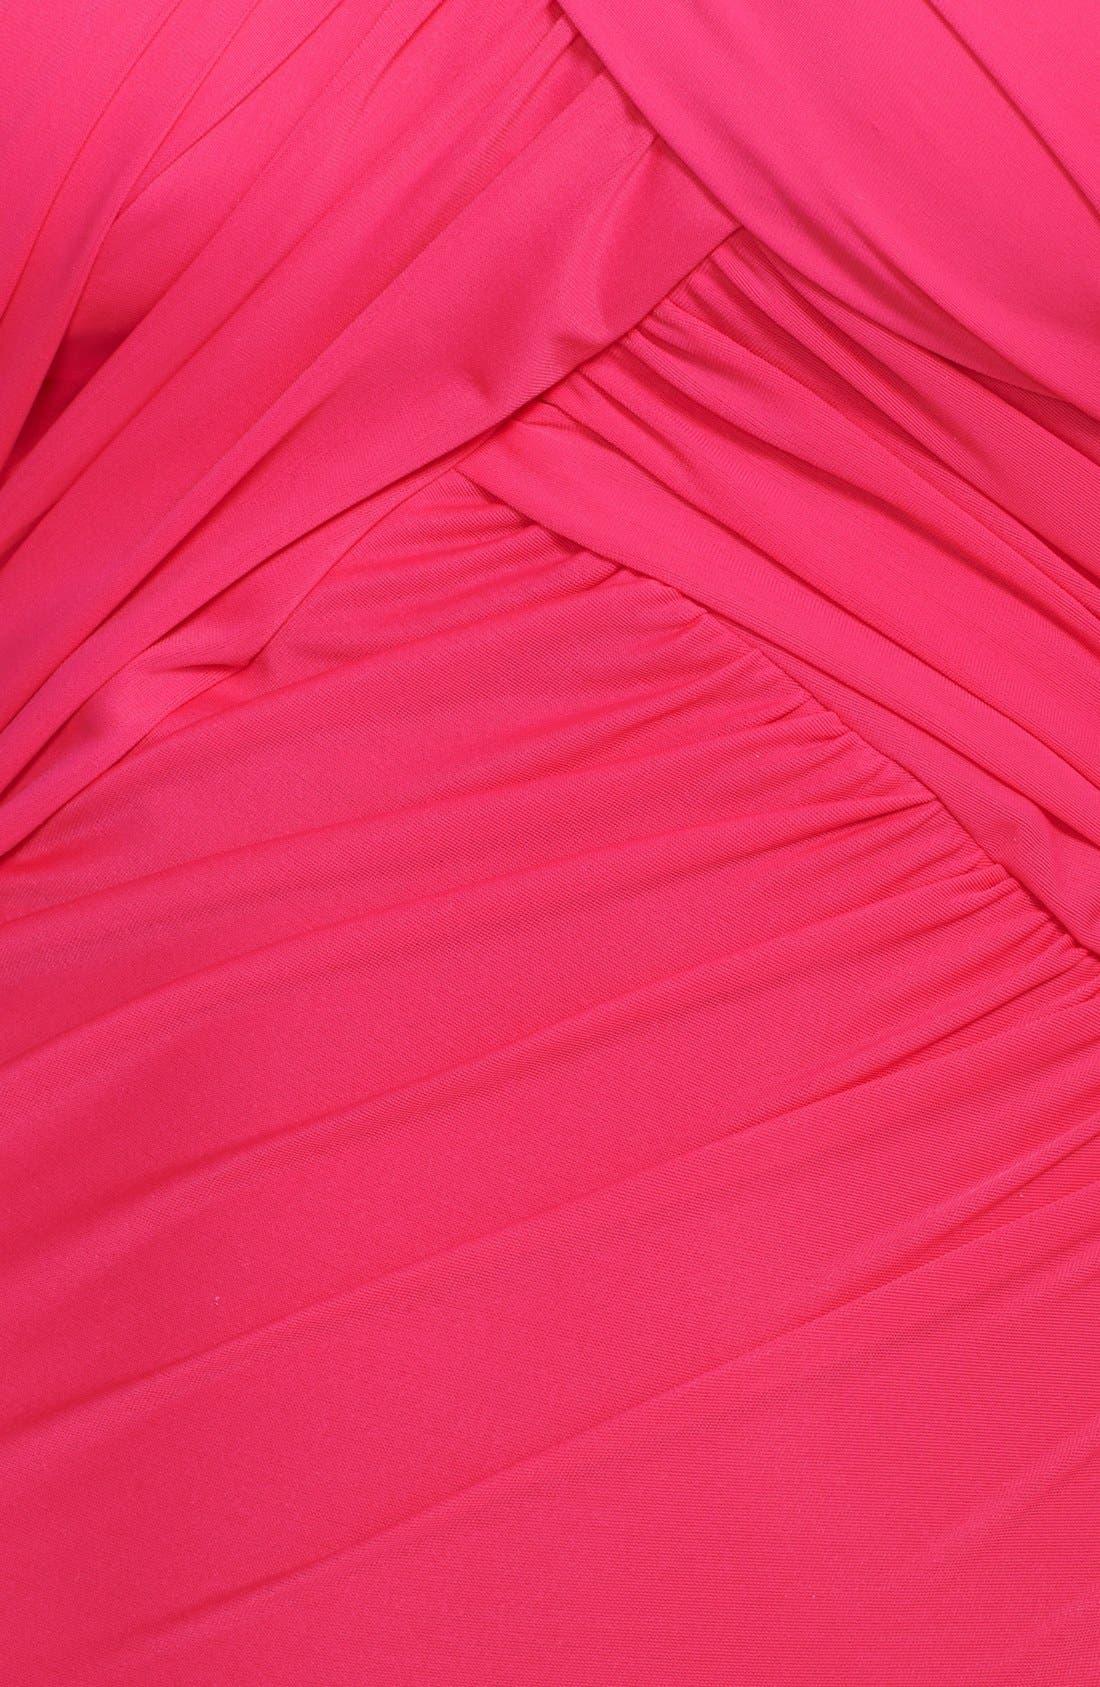 Alternate Image 3  - Miraclesuit® Crisscross One-Piece Swimsuit